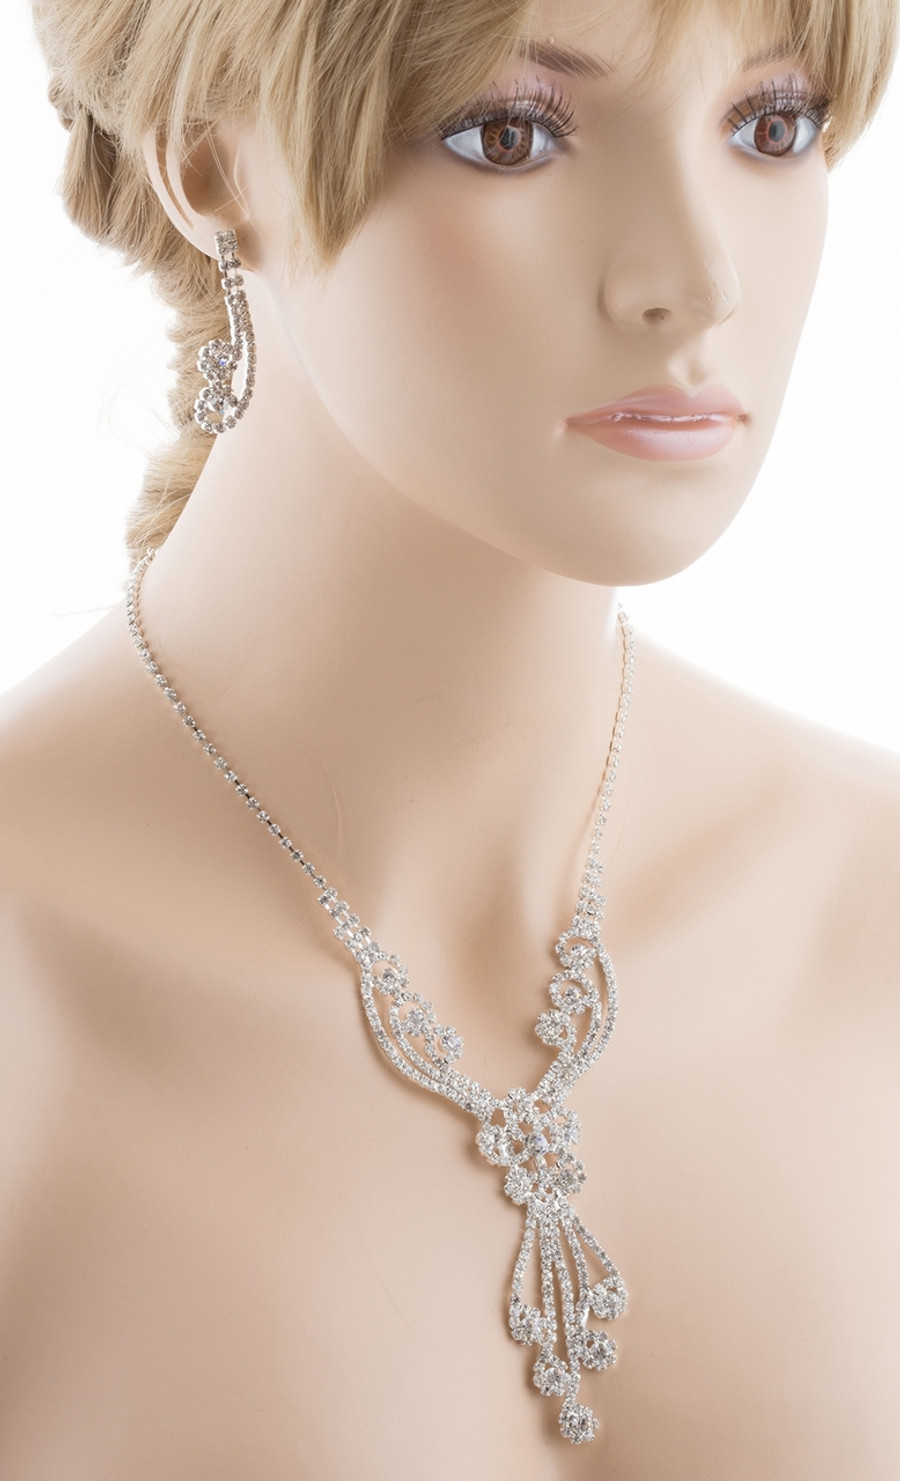 Bridal Wedding Jewelry Set Crystal Rhinestones Gorgeous Dazzle Design Necklace